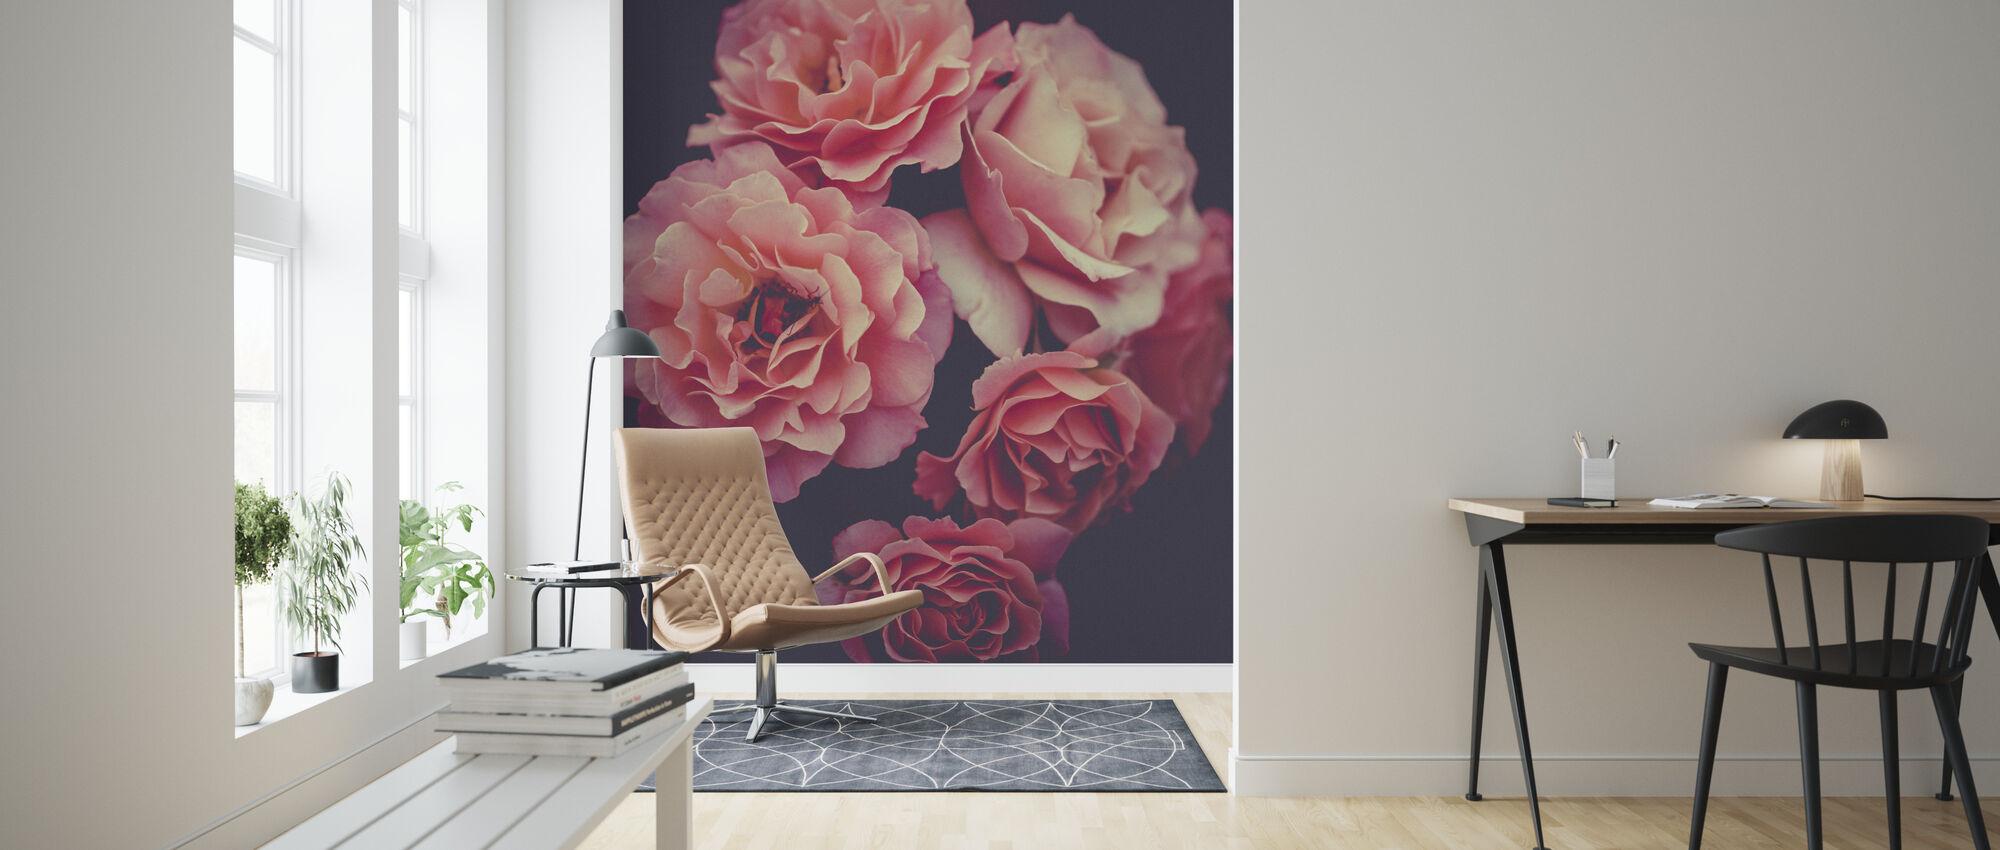 Rose Bouquet - Wallpaper - Living Room